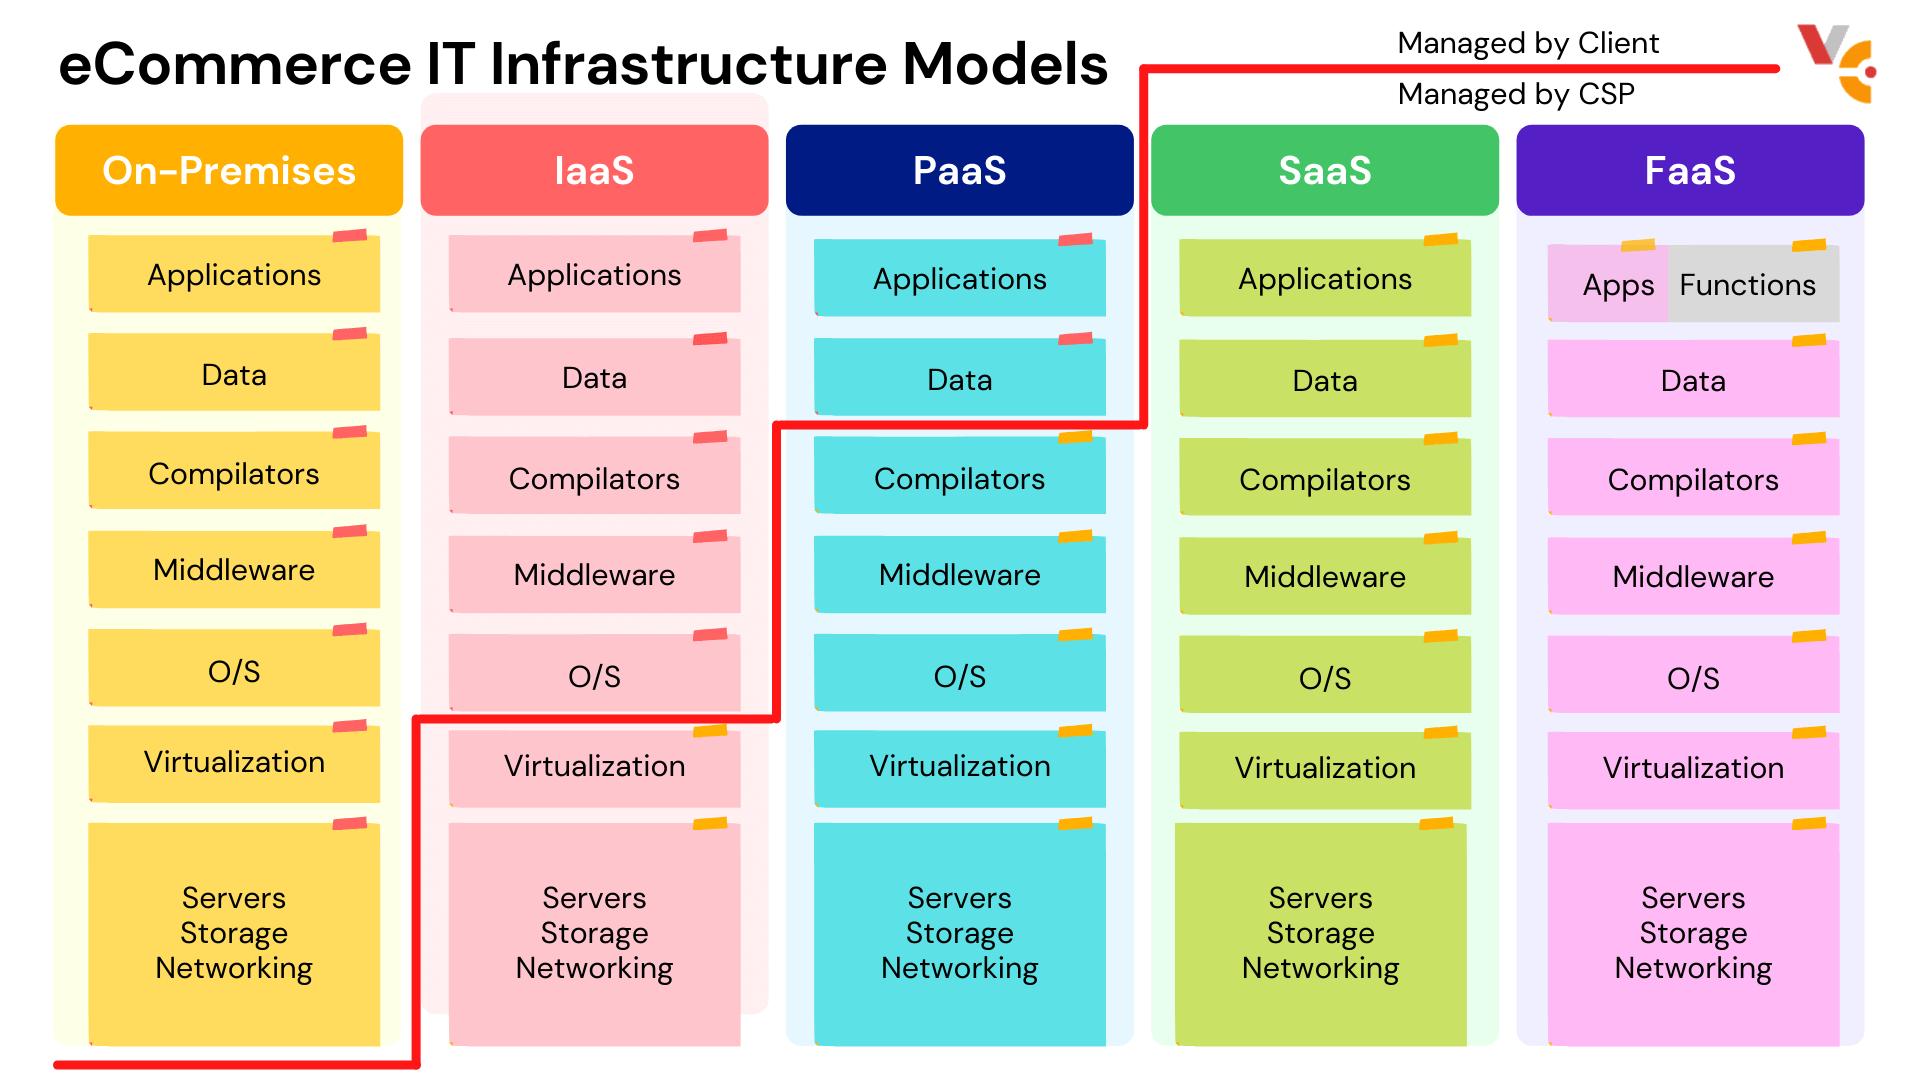 ecommerce IT infrastructure model